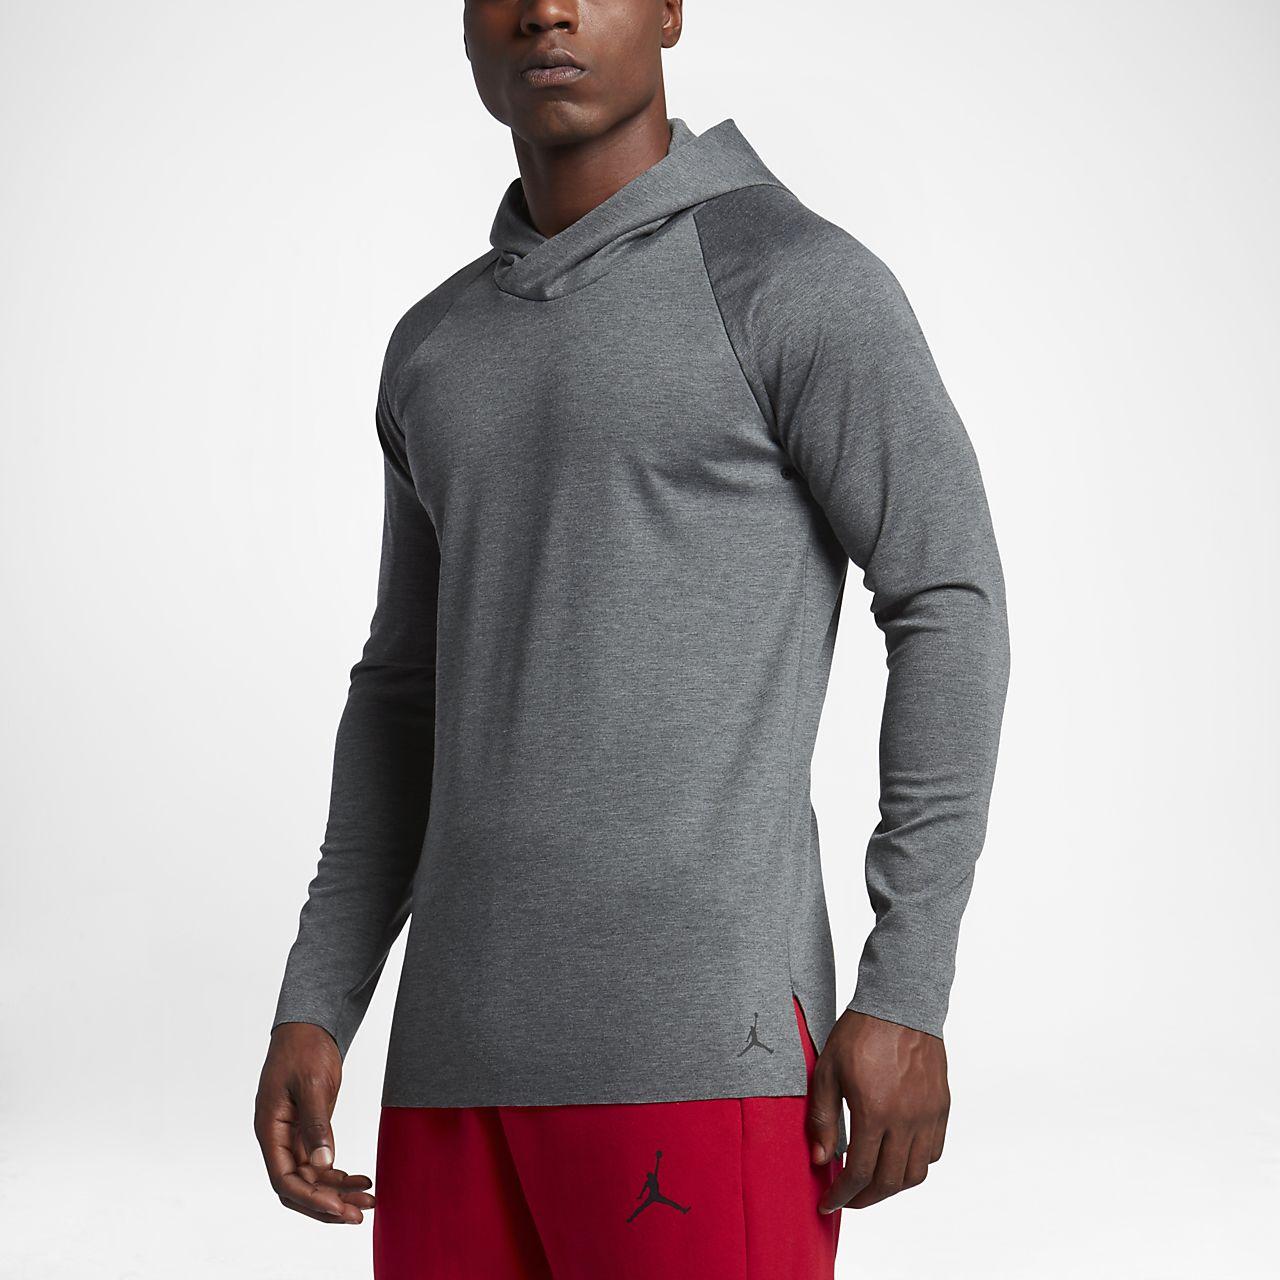 Jordan 23 Lux Raglan Men's Short Sleeve Top Charcoal Heather/Black